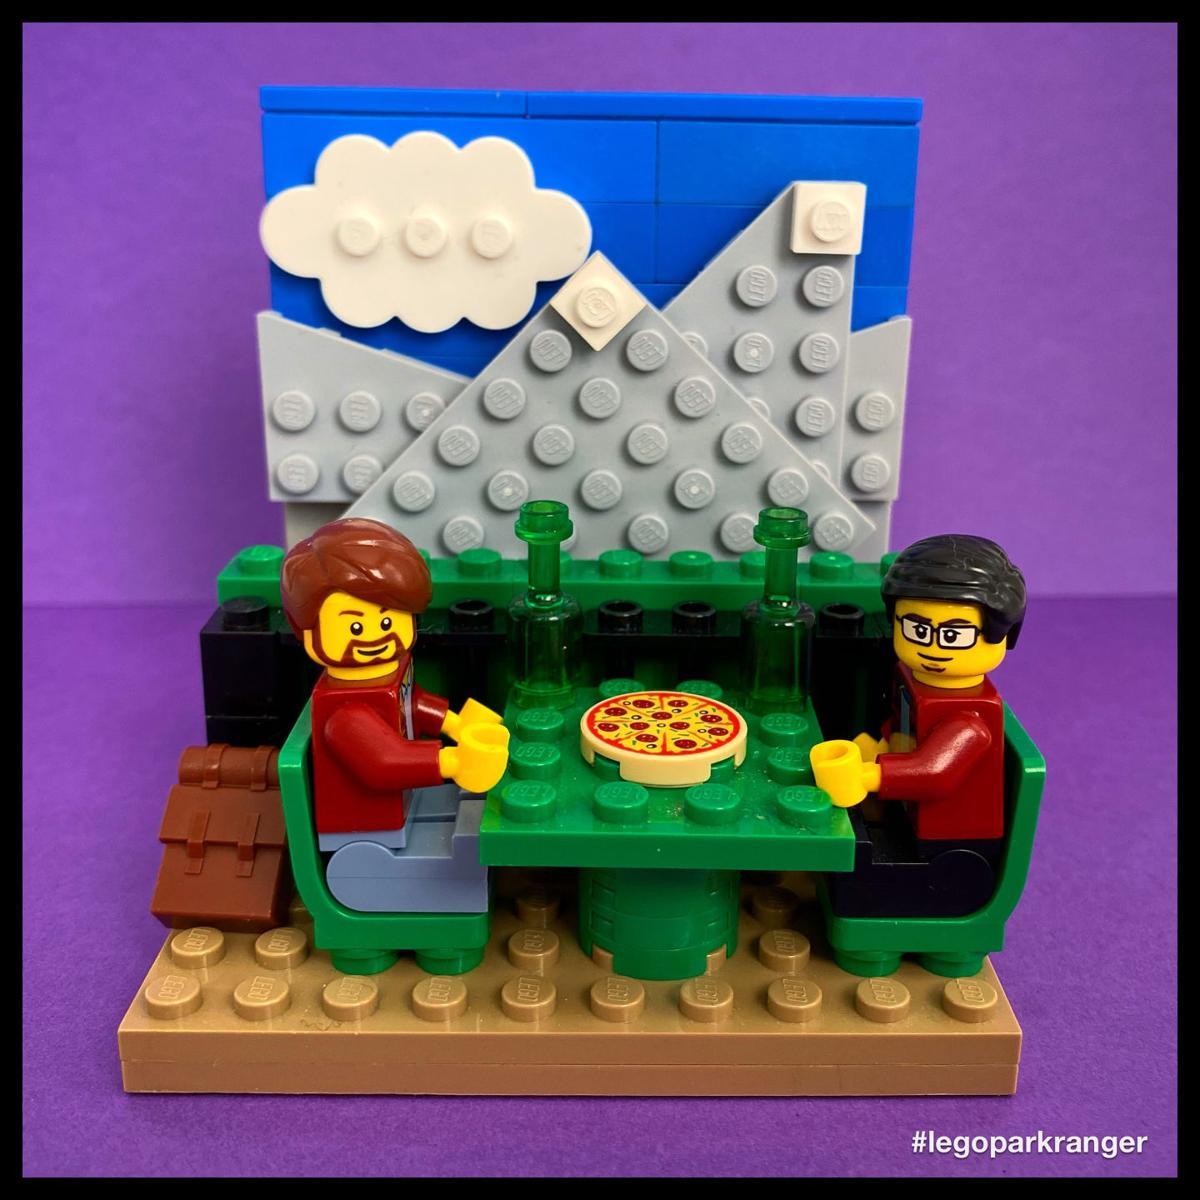 LEGO Grand Teton pizza